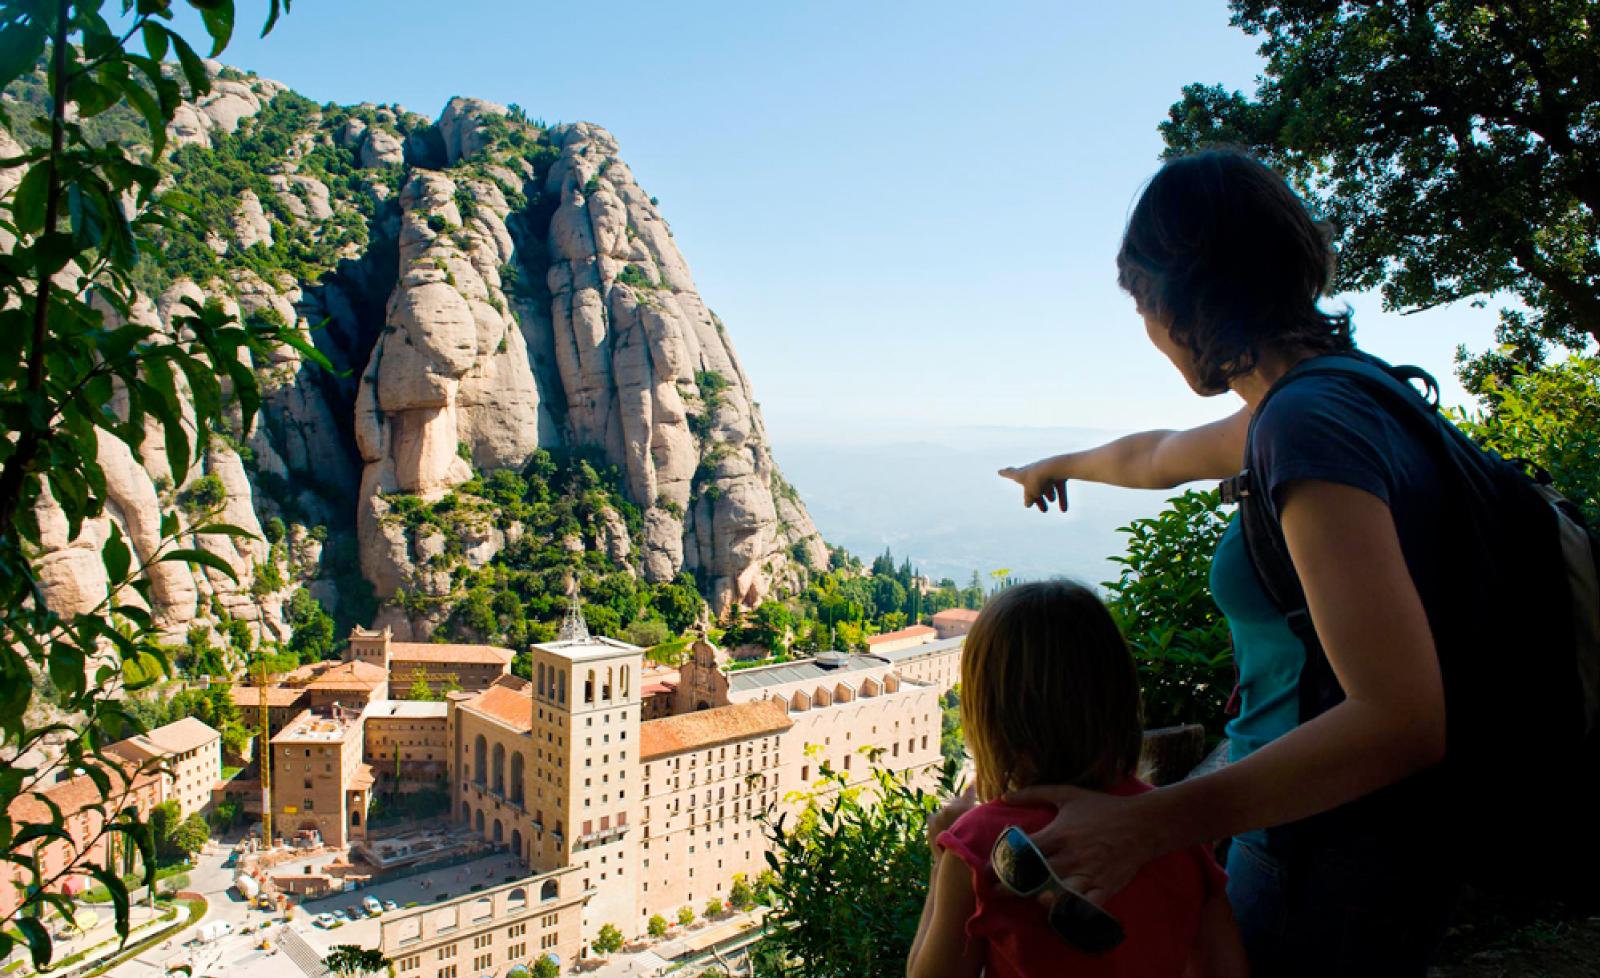 Monestir-de-Montserrat-©-Gemma-Miralda-Escud